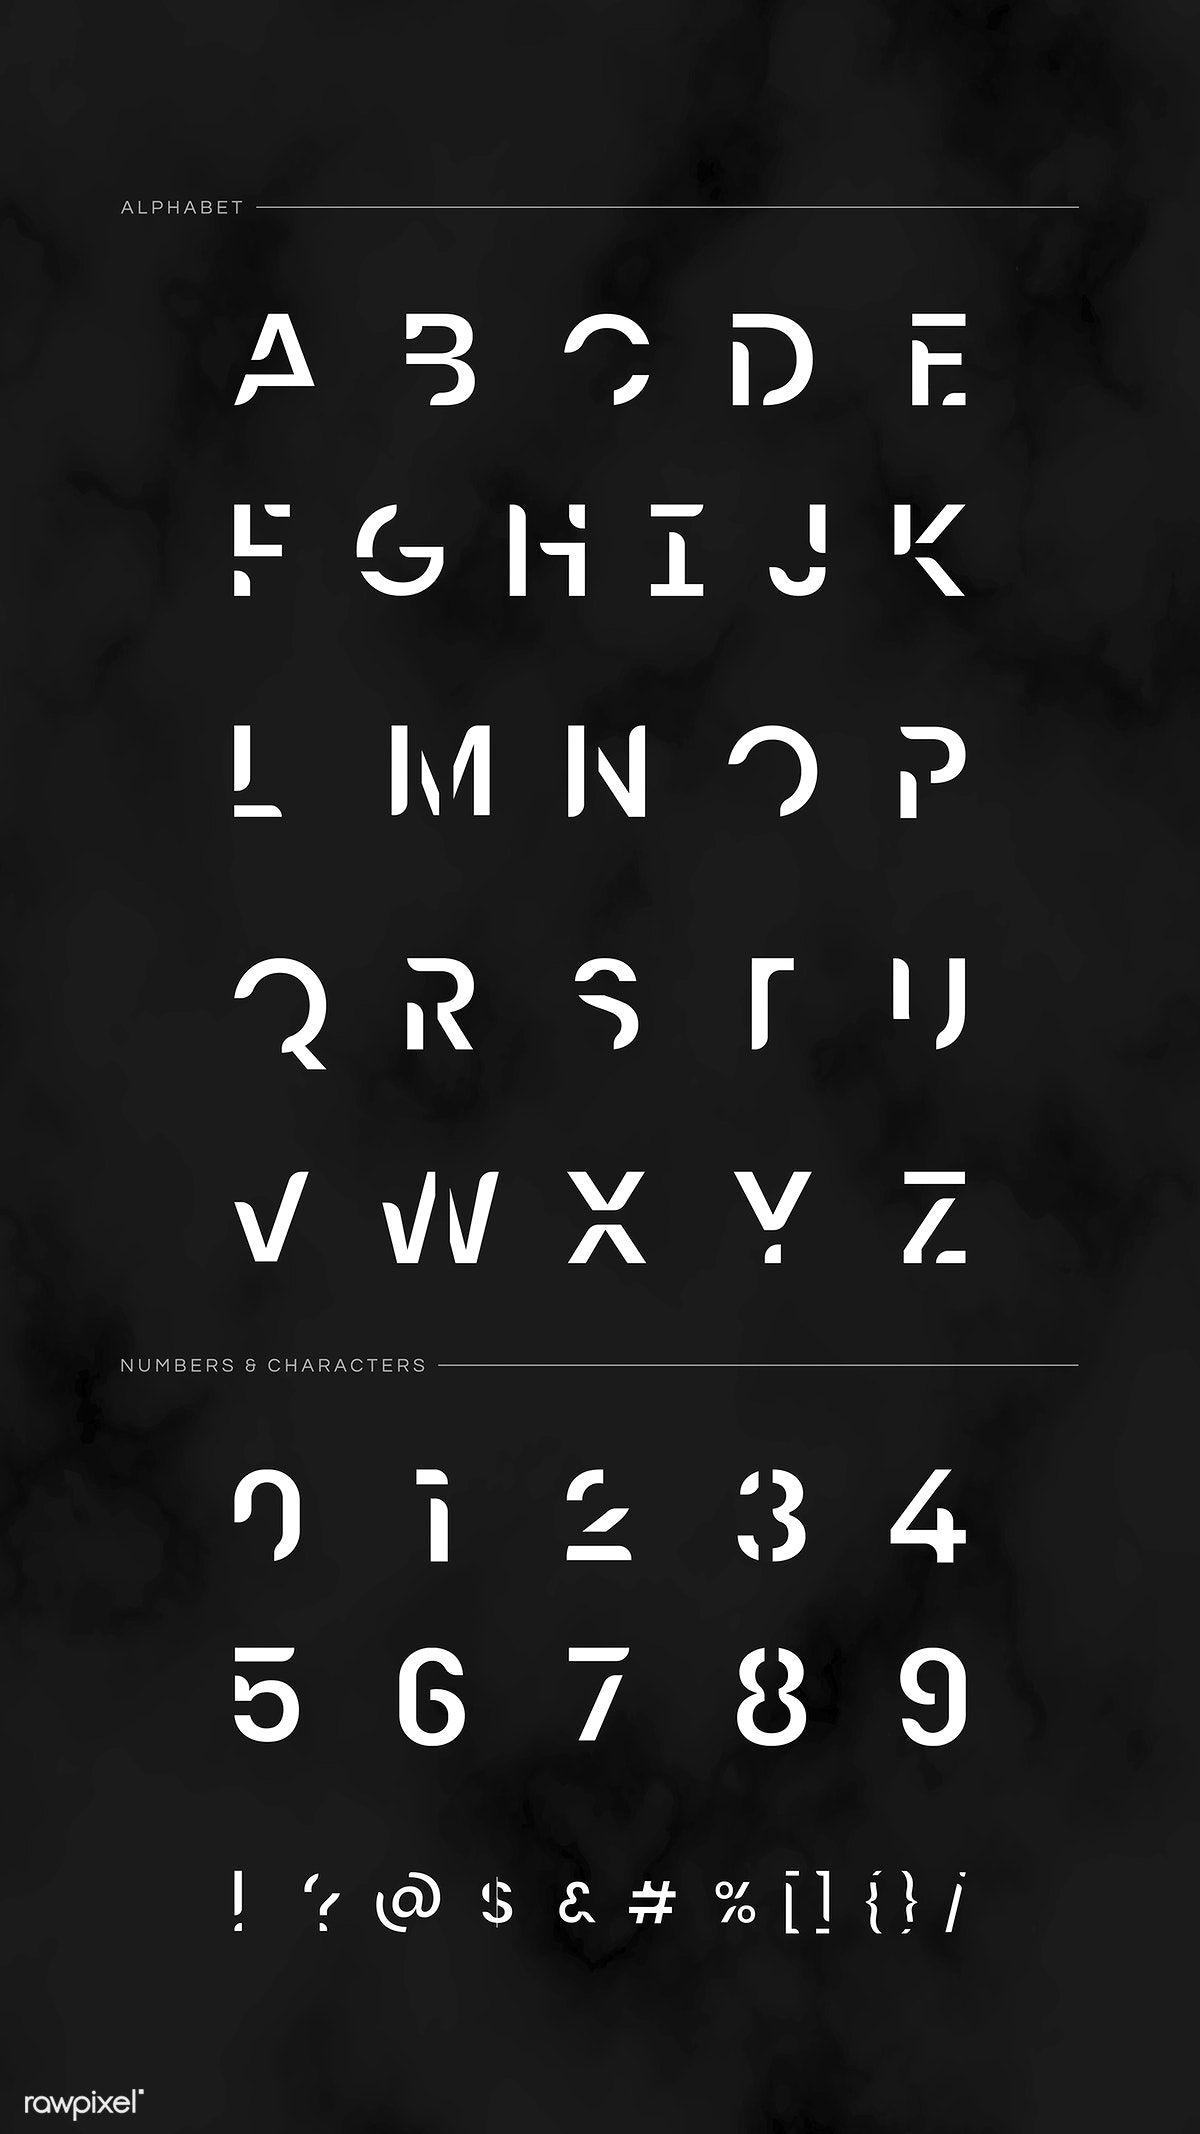 The English alphabet typography vector   premium image by rawpixel.com / Aew #vector #vectoart #digitalpainting #digitalartist #garphicdesign #sketch #digitaldrawing #doodle #illustrator #digitalillustration #modernart #alphabet